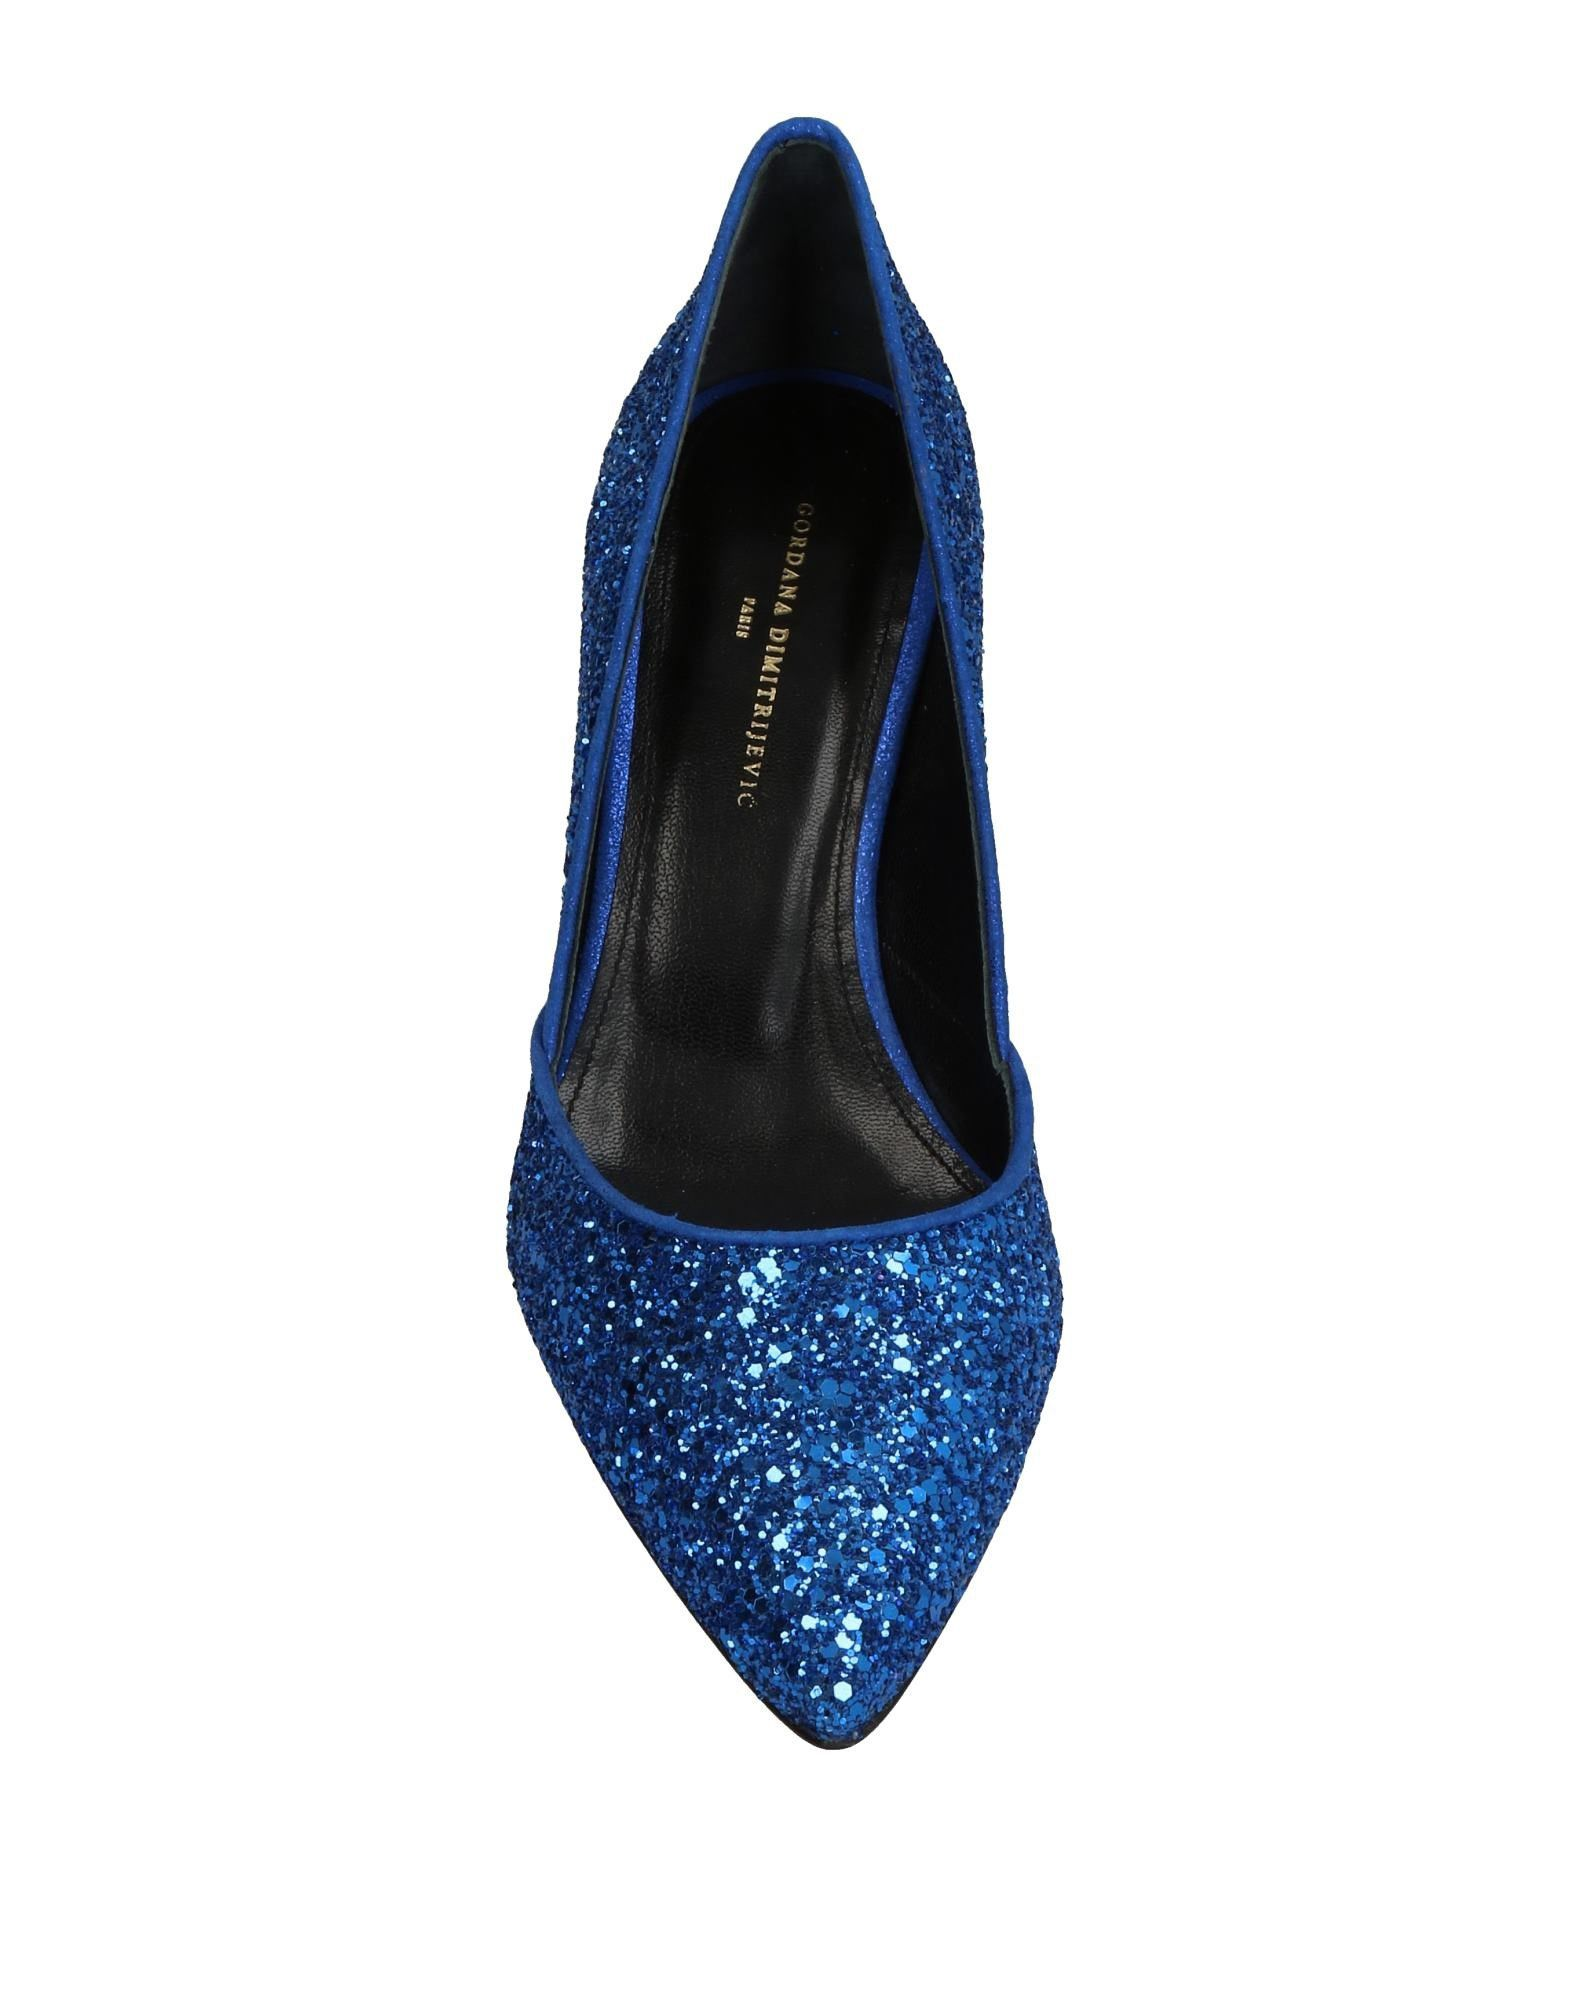 Gordana Dimitrijević Pumps Damen  11330242VV Gute Qualität beliebte Schuhe